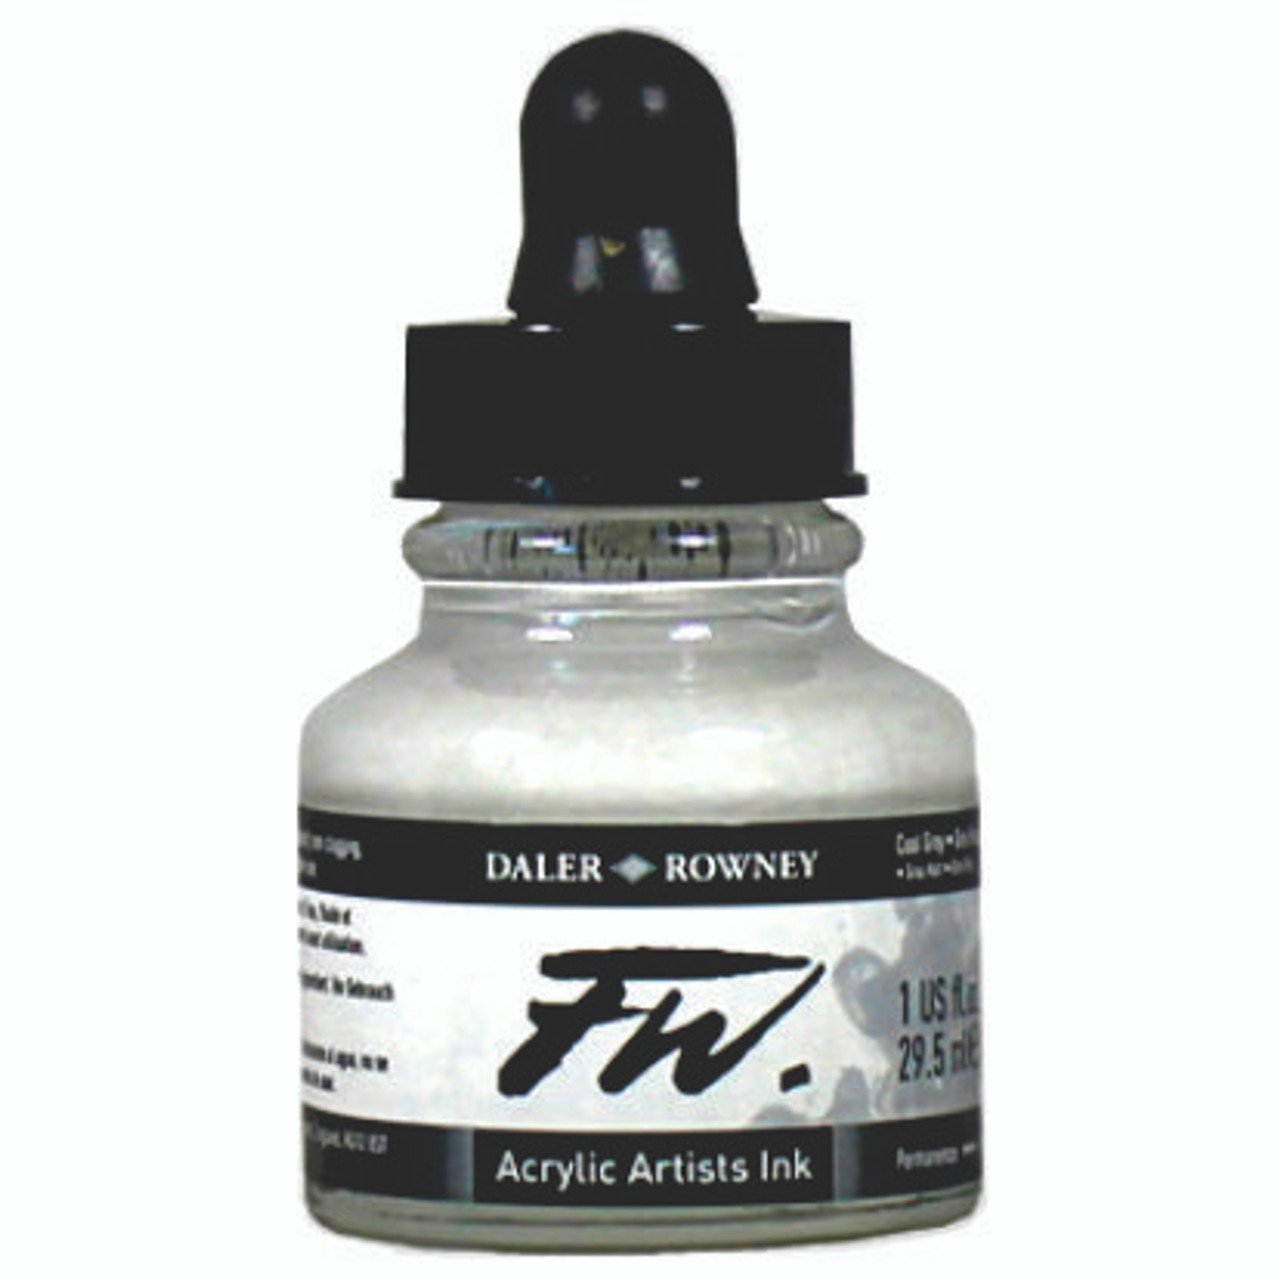 FW Acrylic Artists' Ink 29.5ml - Silver IMIT #702